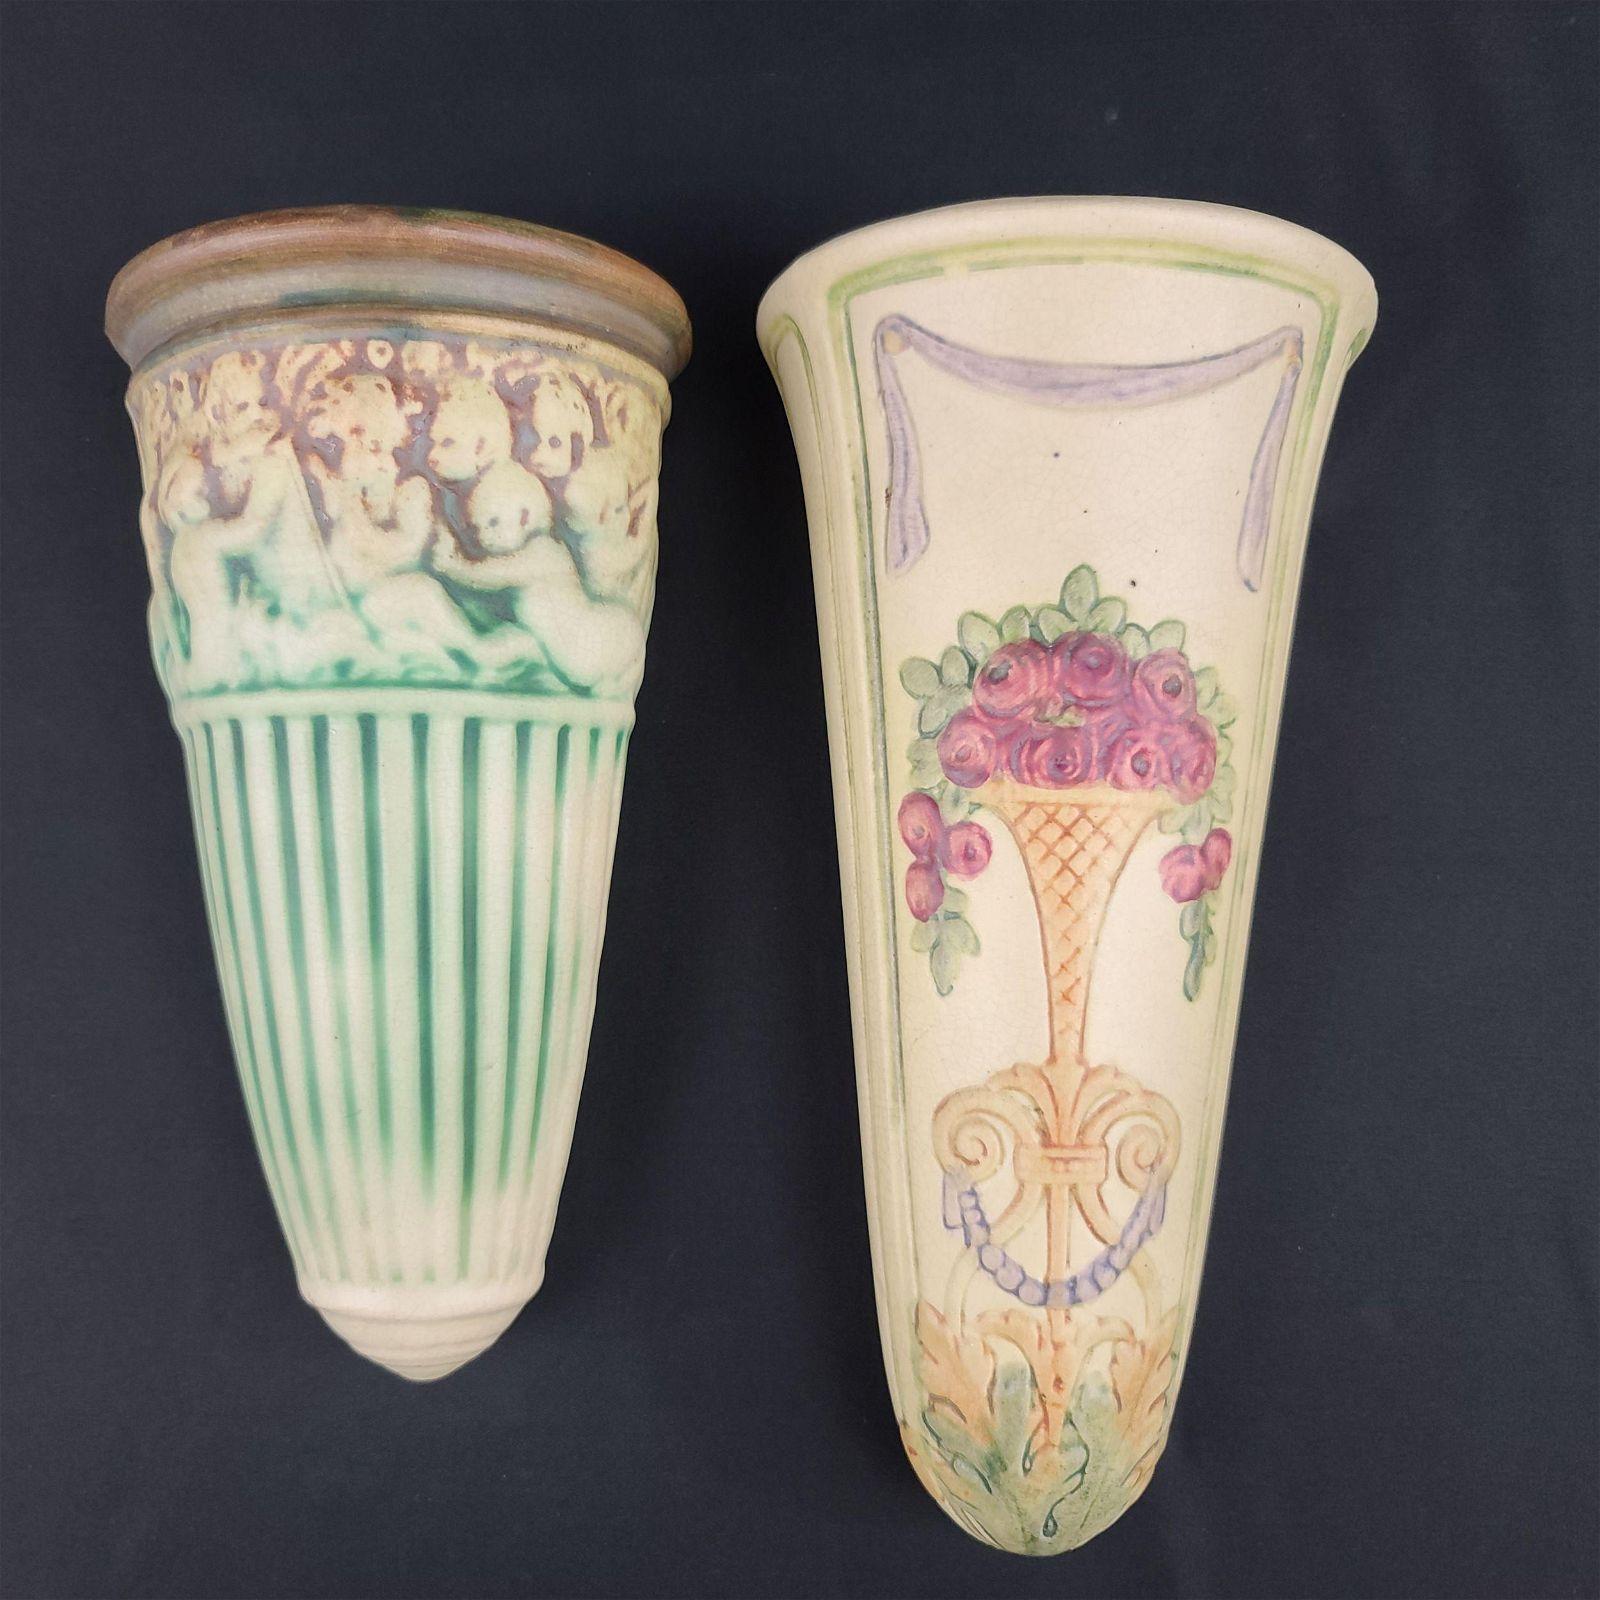 2 Antique Weller Pocket Vases Fairfield 1914-15